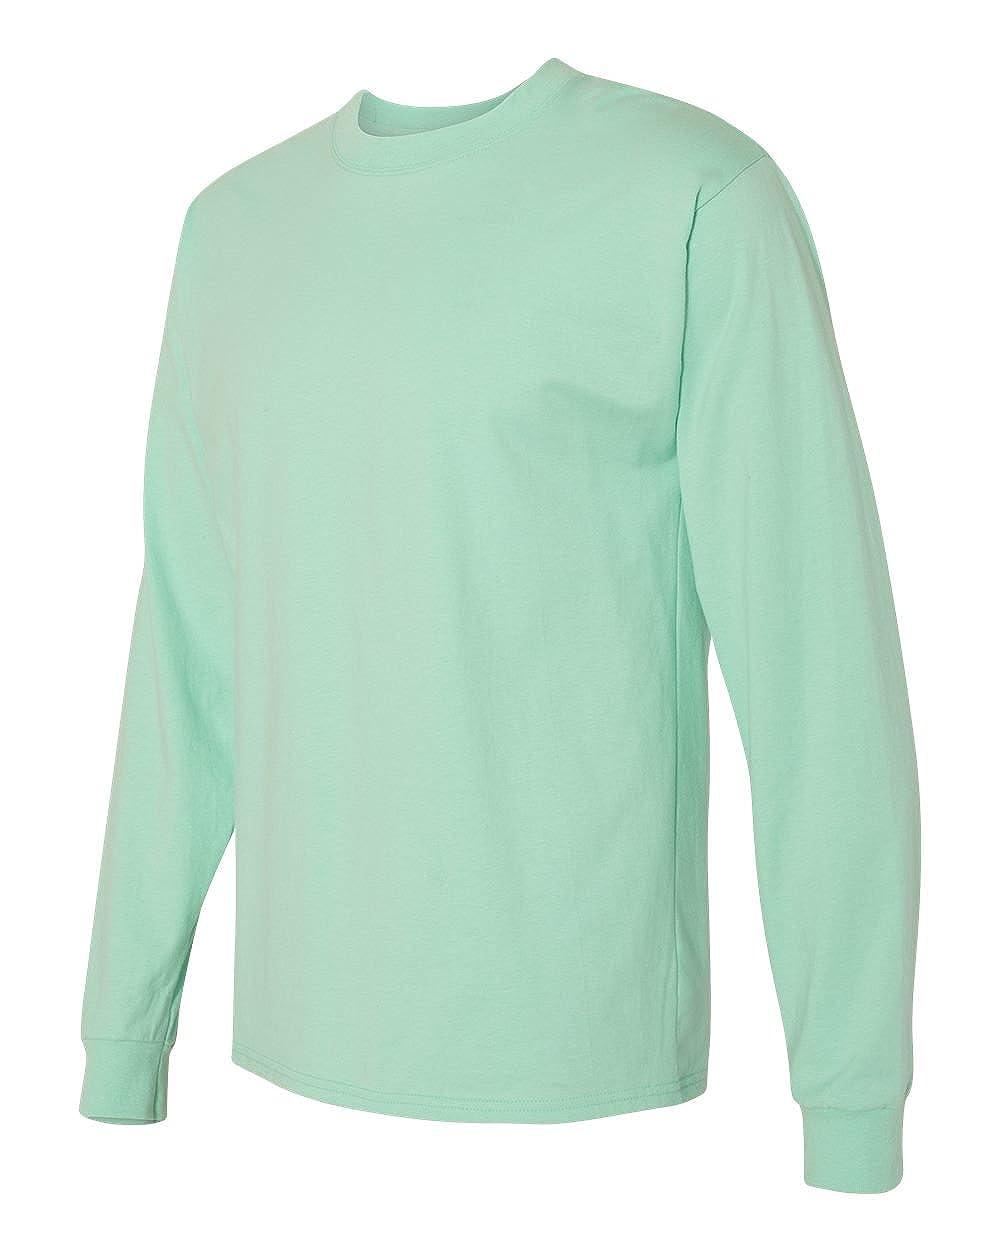 Hanes Long Sleeve Beefy-T T-Shirts